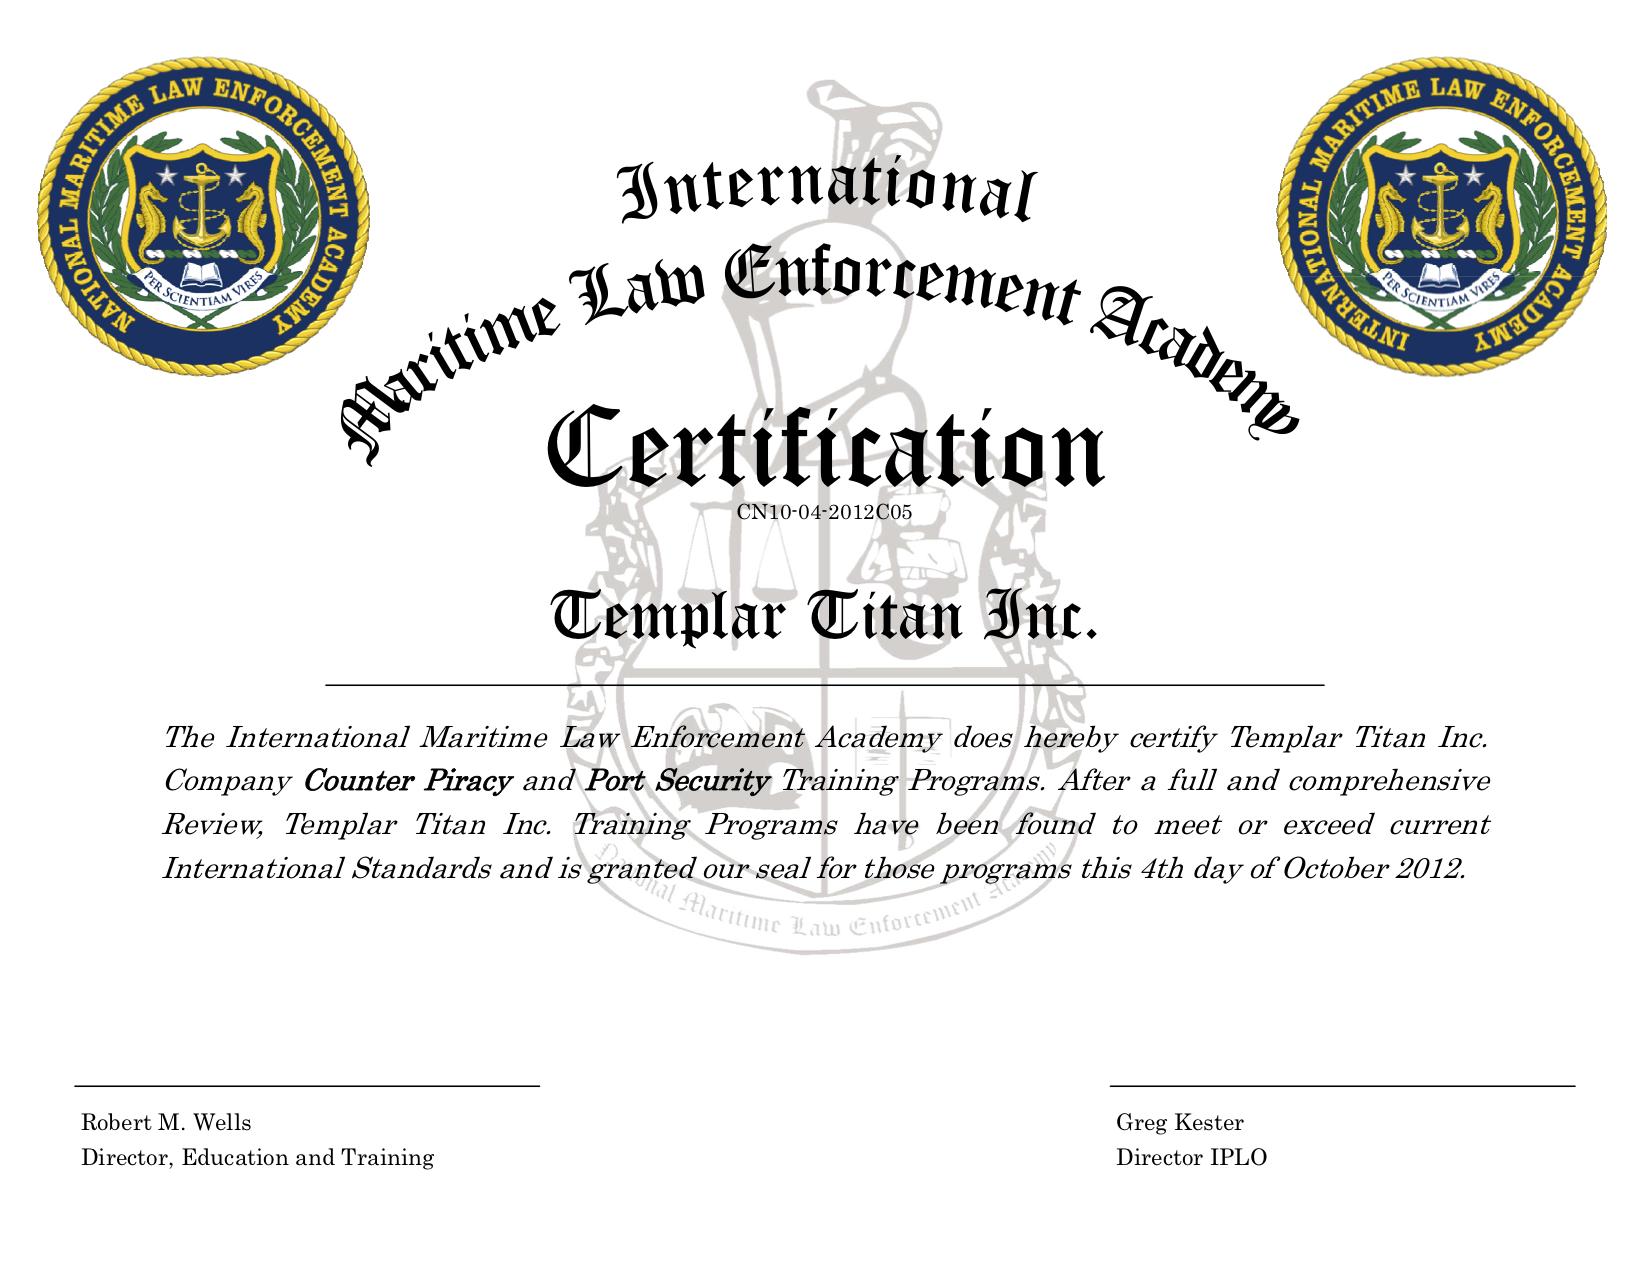 National Maritime Law Enforcement Academy Templar Titan